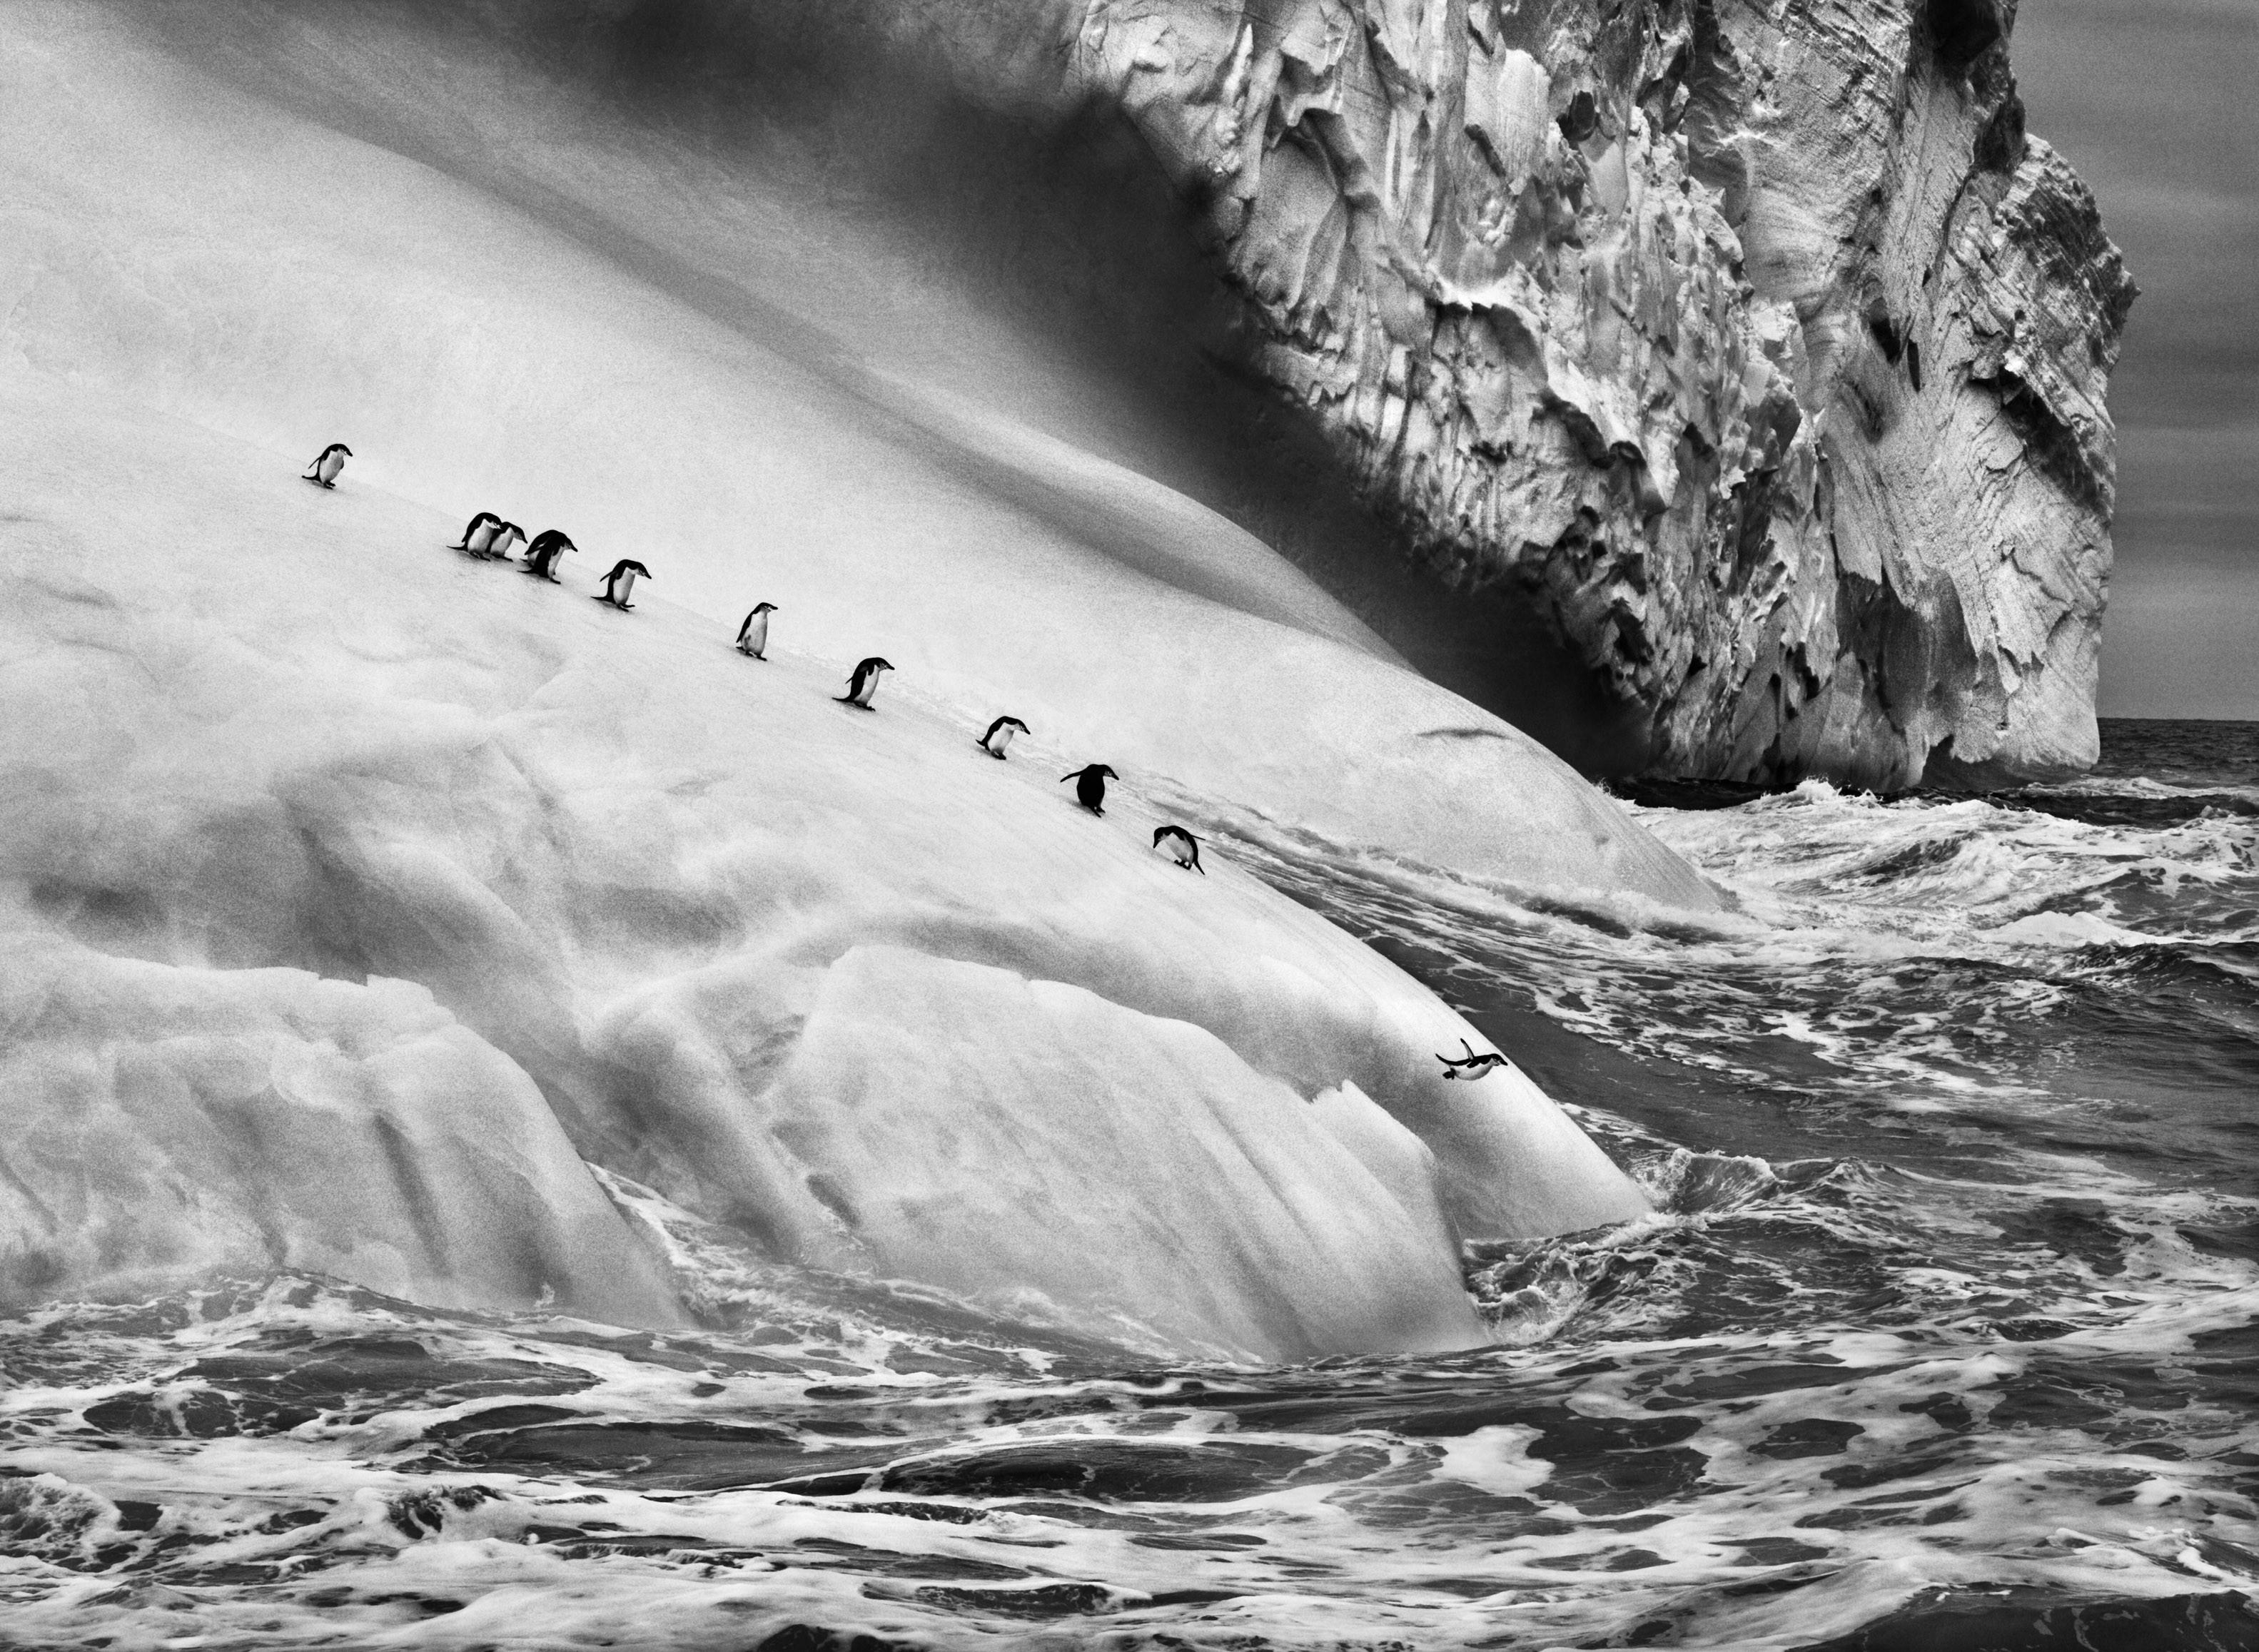 General 3165x2315 nature landscape animals ice penguins iceberg monochrome Sebastiao Salgado Antarctica sea waves photography jumping